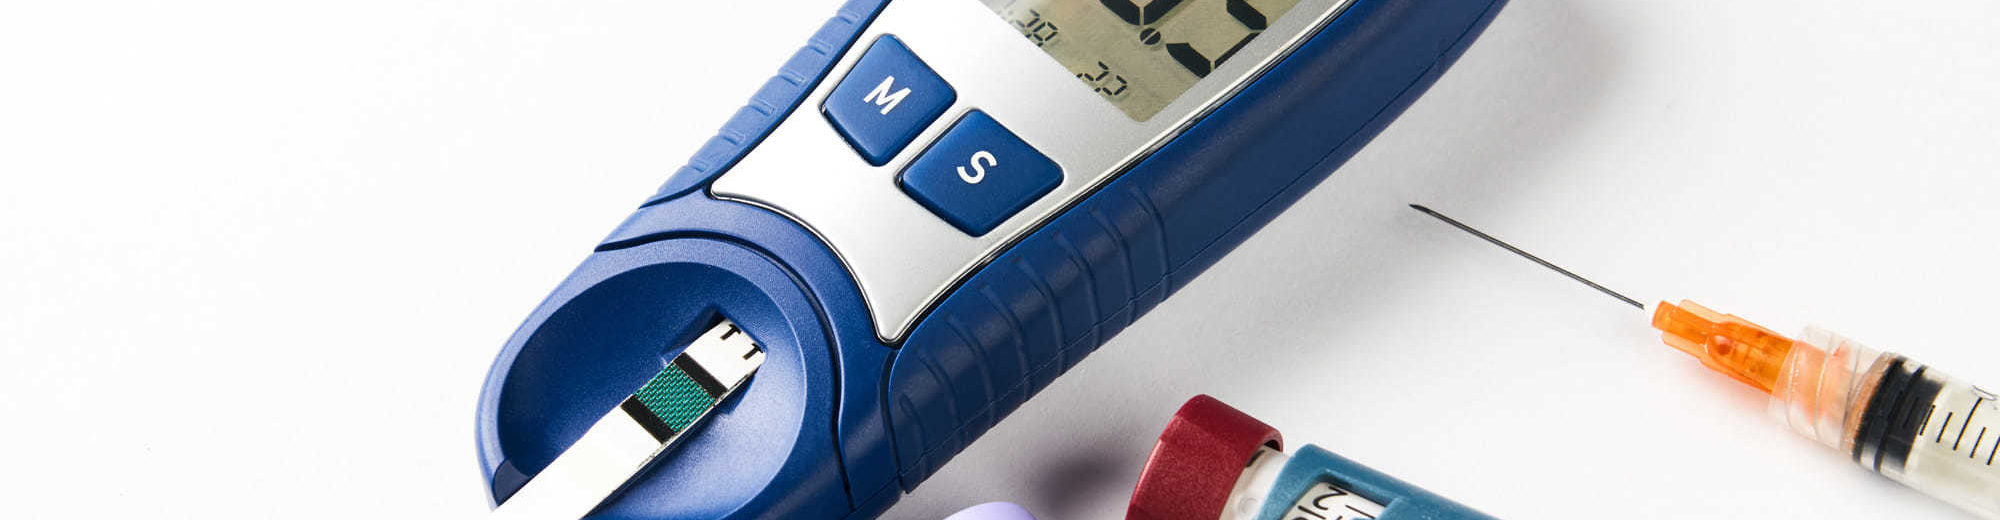 Diabetic Measuring Lancet Instruments on White Background - Biostatistics services | Amarex